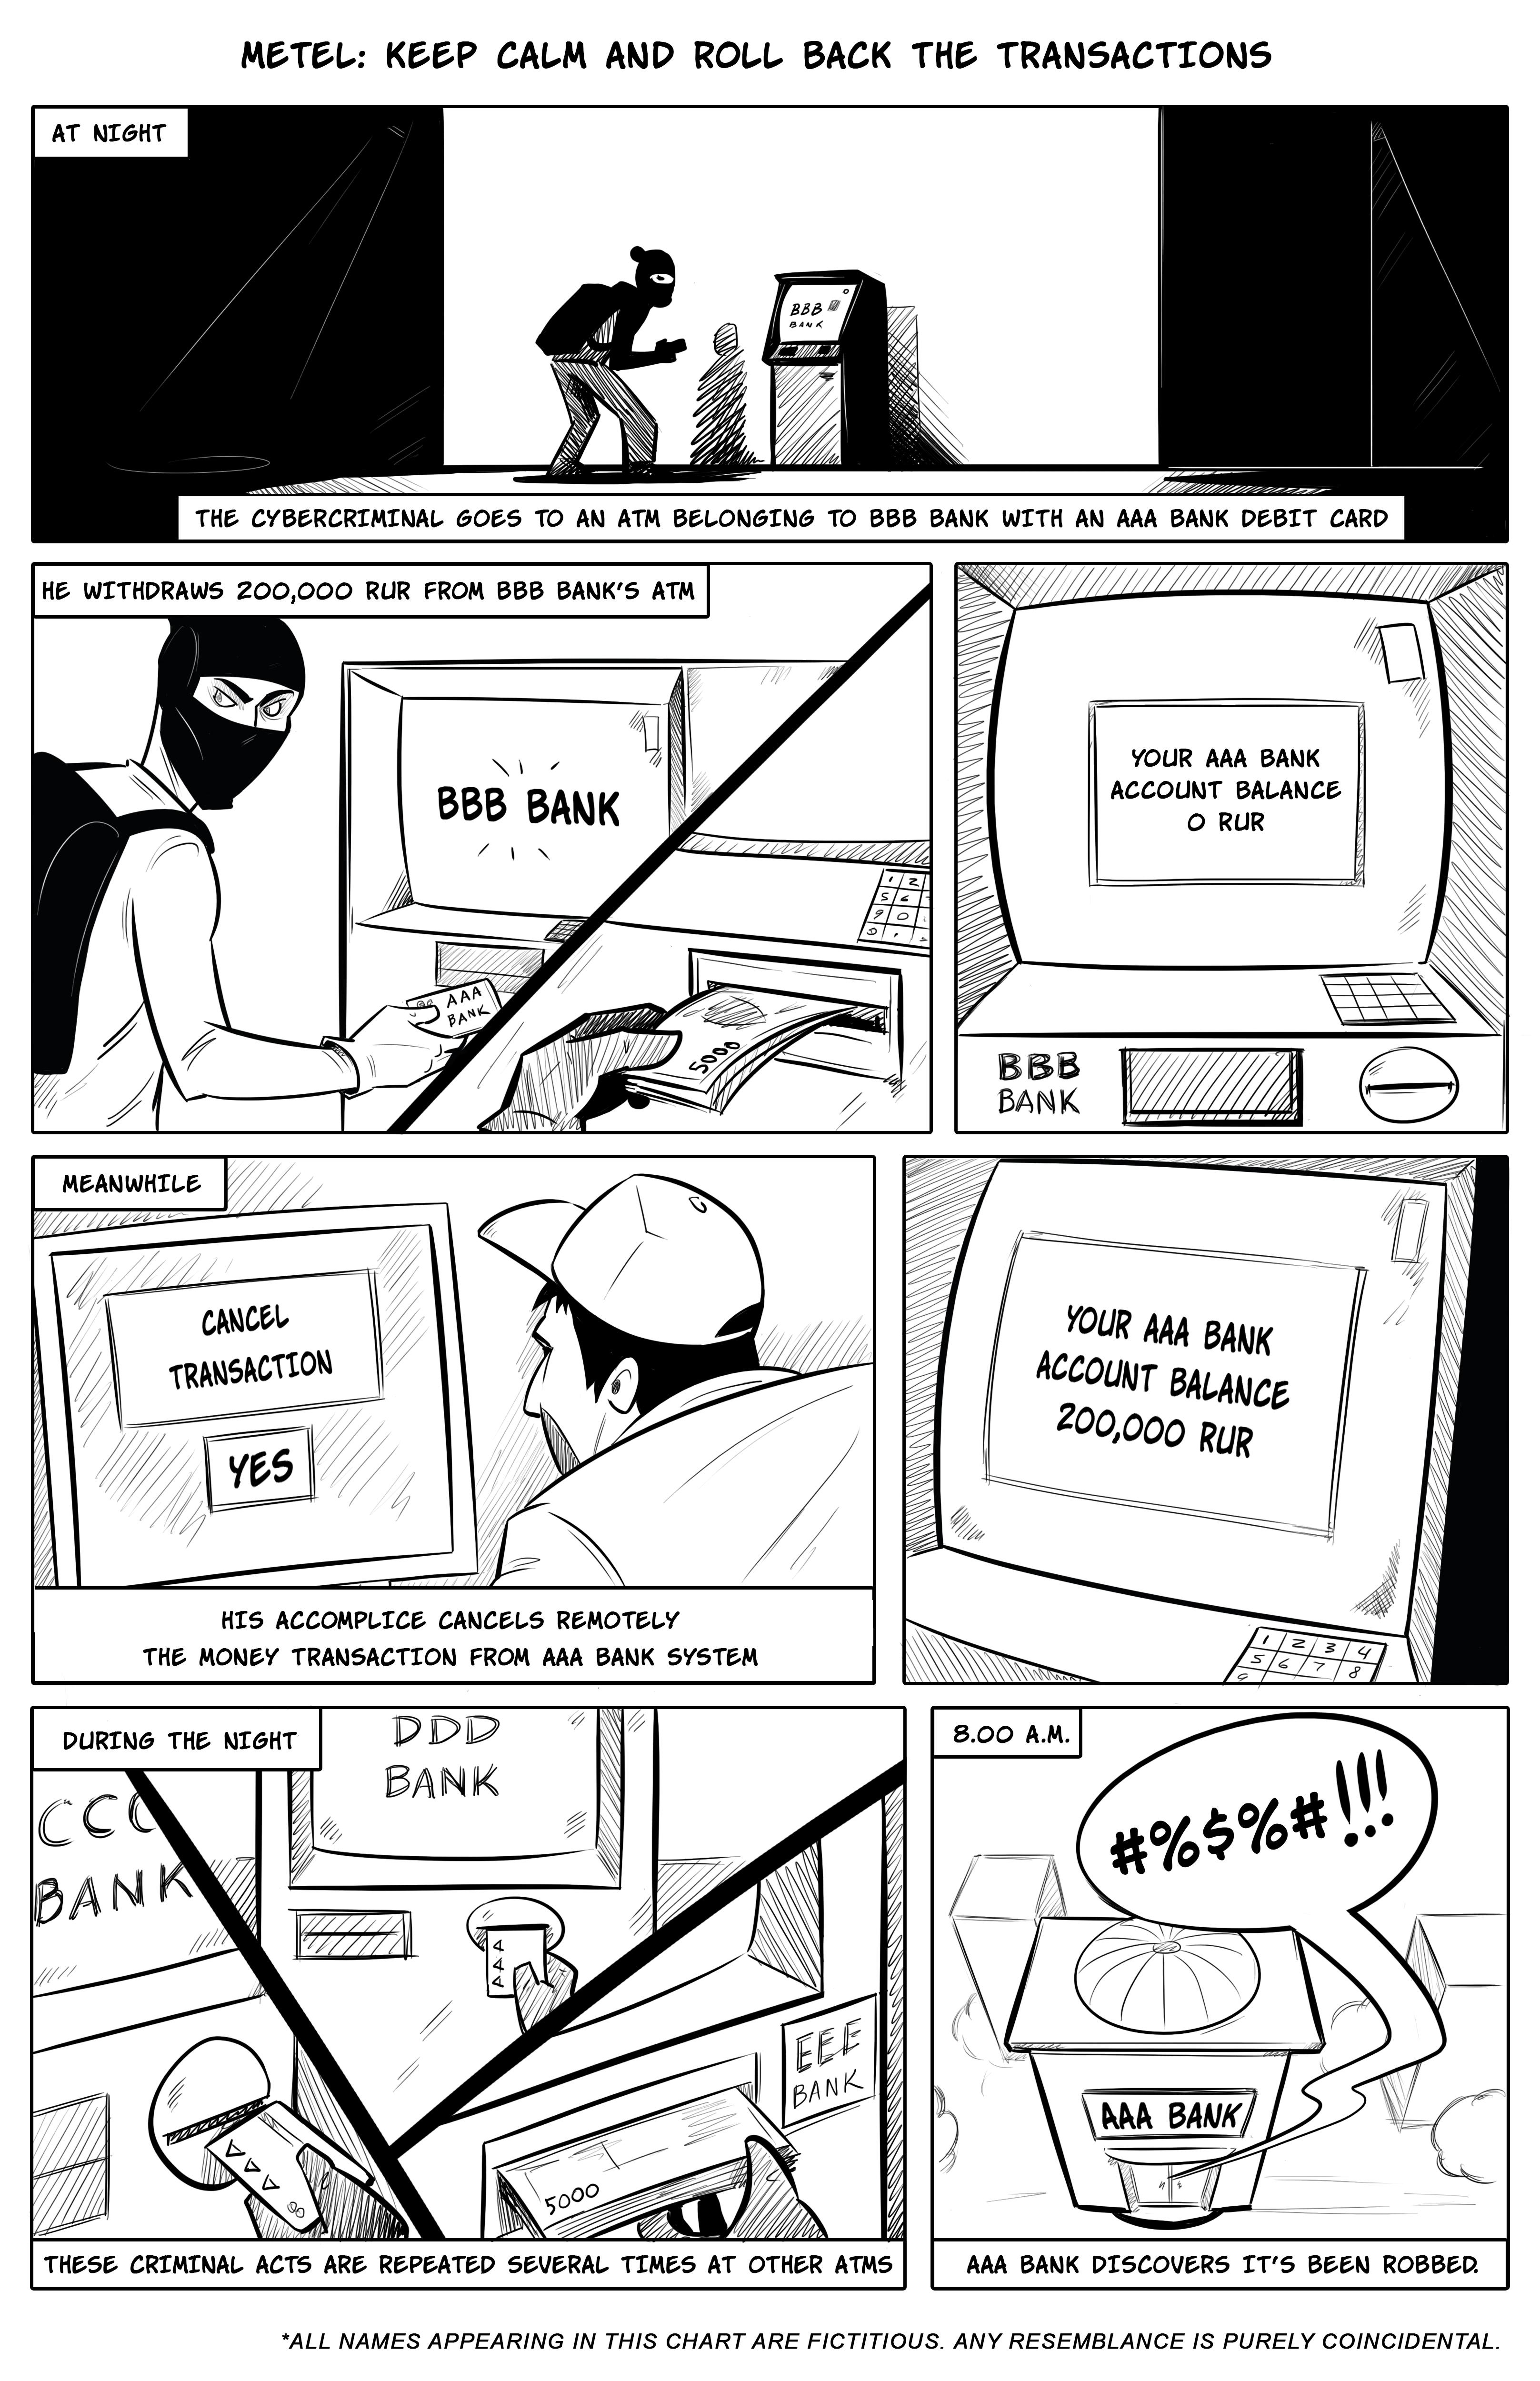 Kaspersky_Infographics_Comic_Metel2 (1)